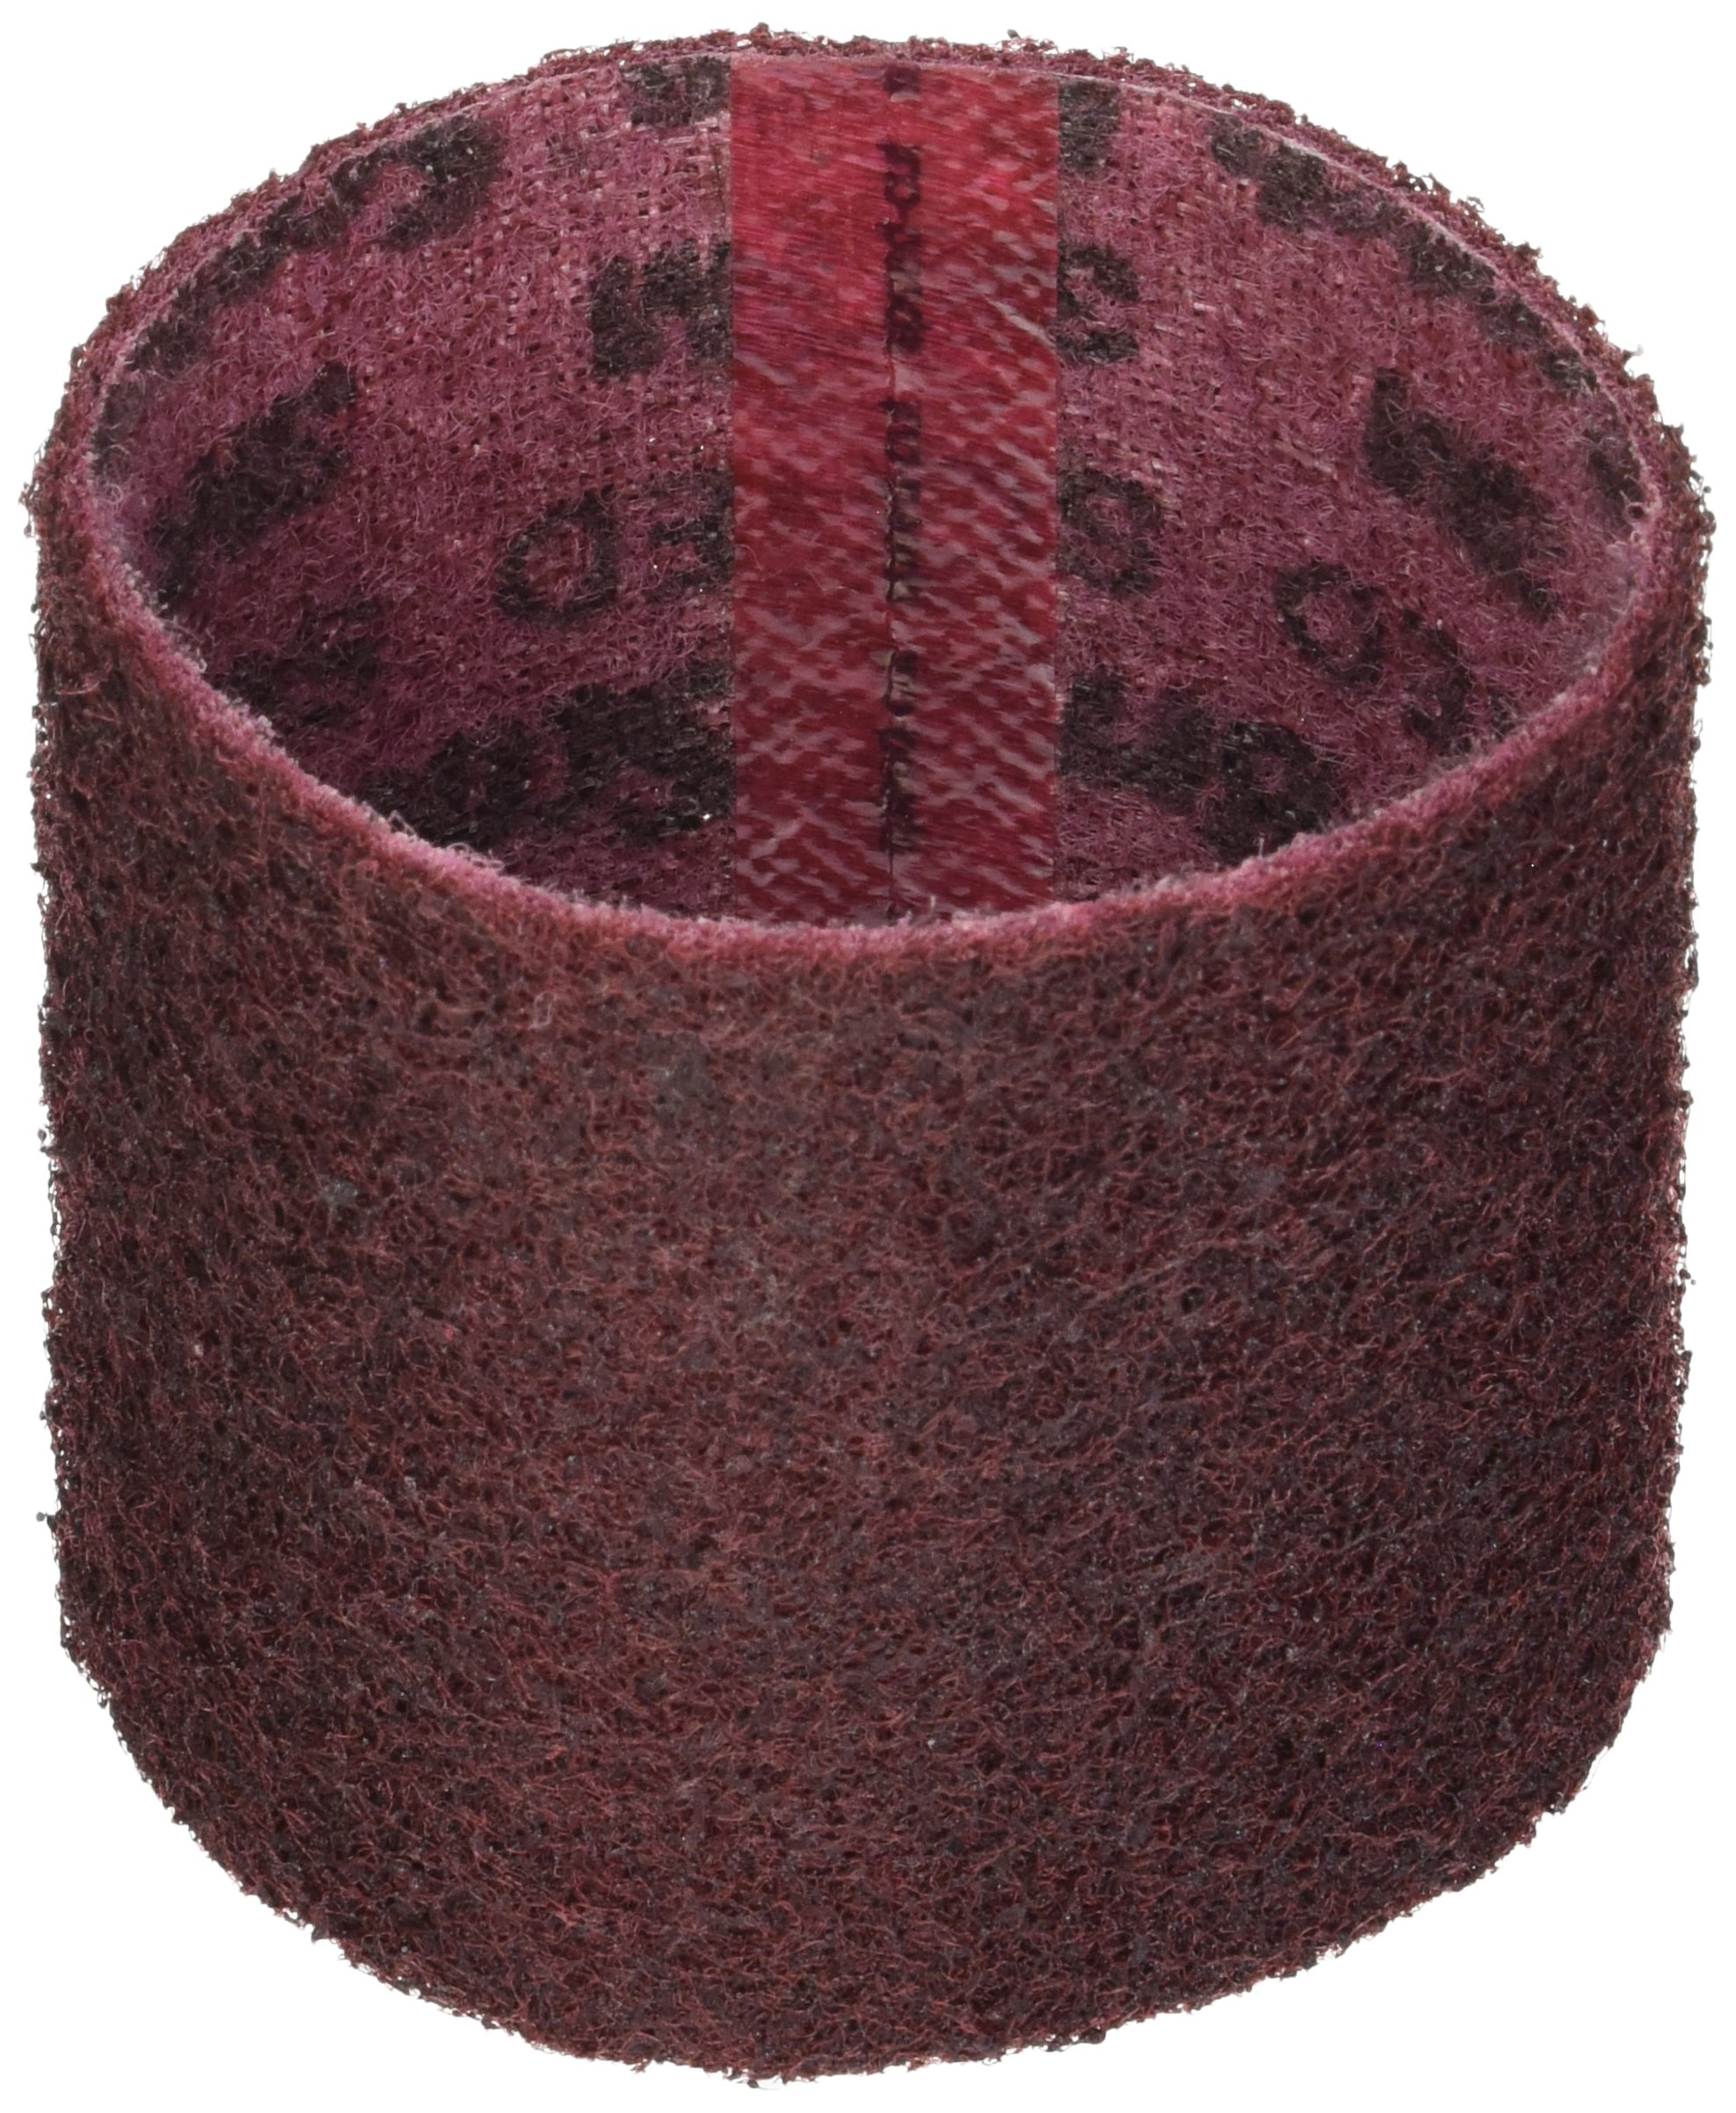 CS Unitec 42011 PTX Fleece Nonwoven Sleeve, Medium, 3-1/2'' Diameter x 4'' Wide, Red, (Pack of 5)